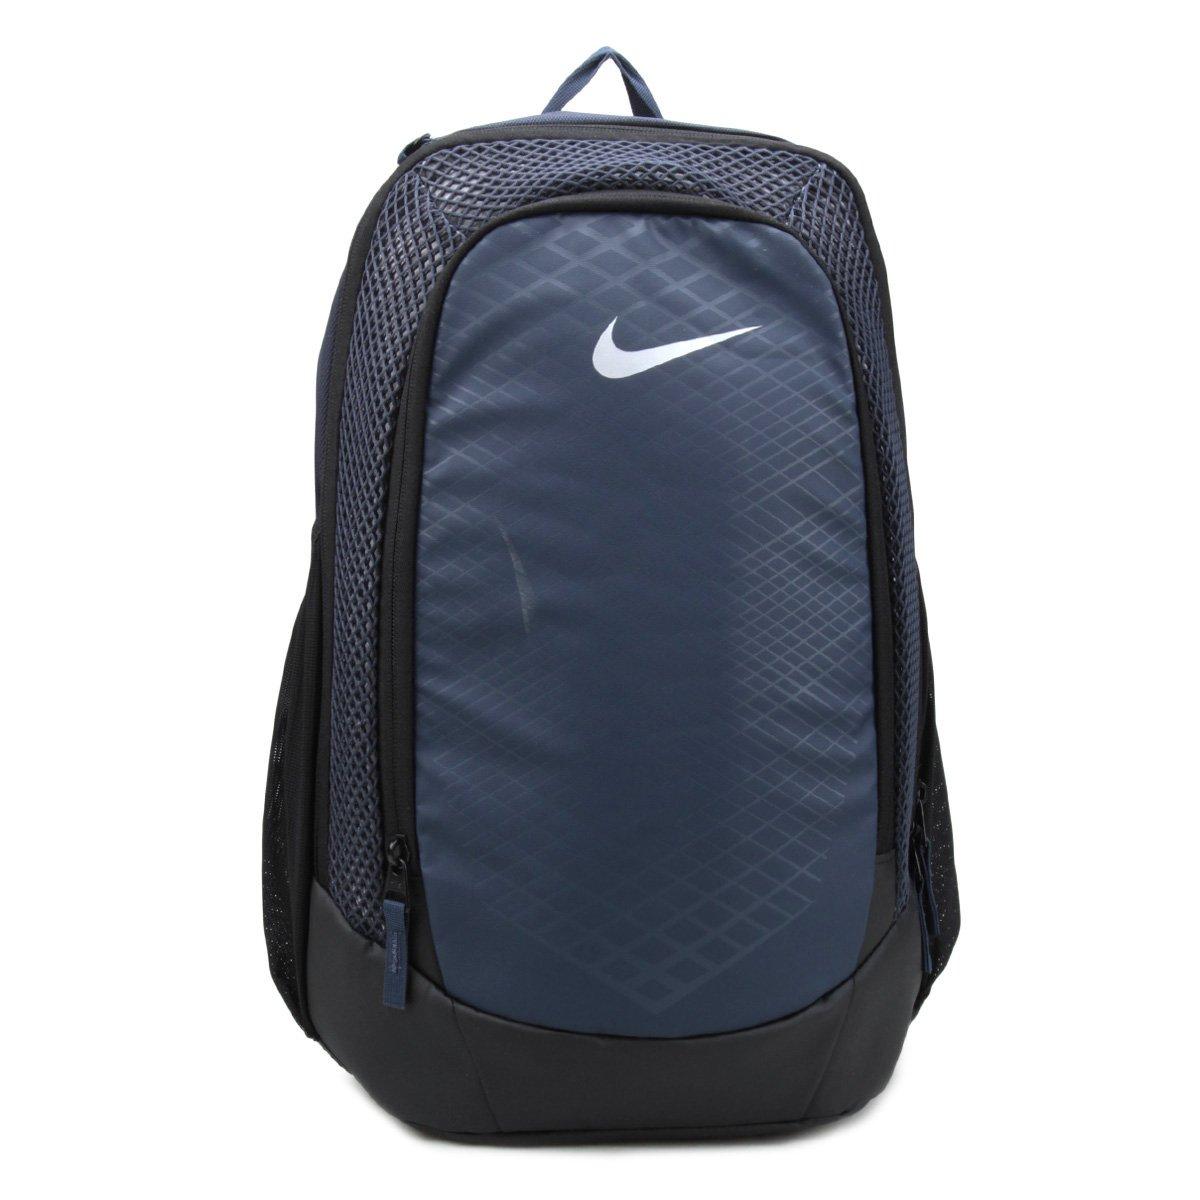 b95cda7c1 Mochila Nike Vapor Speed | Netshoes